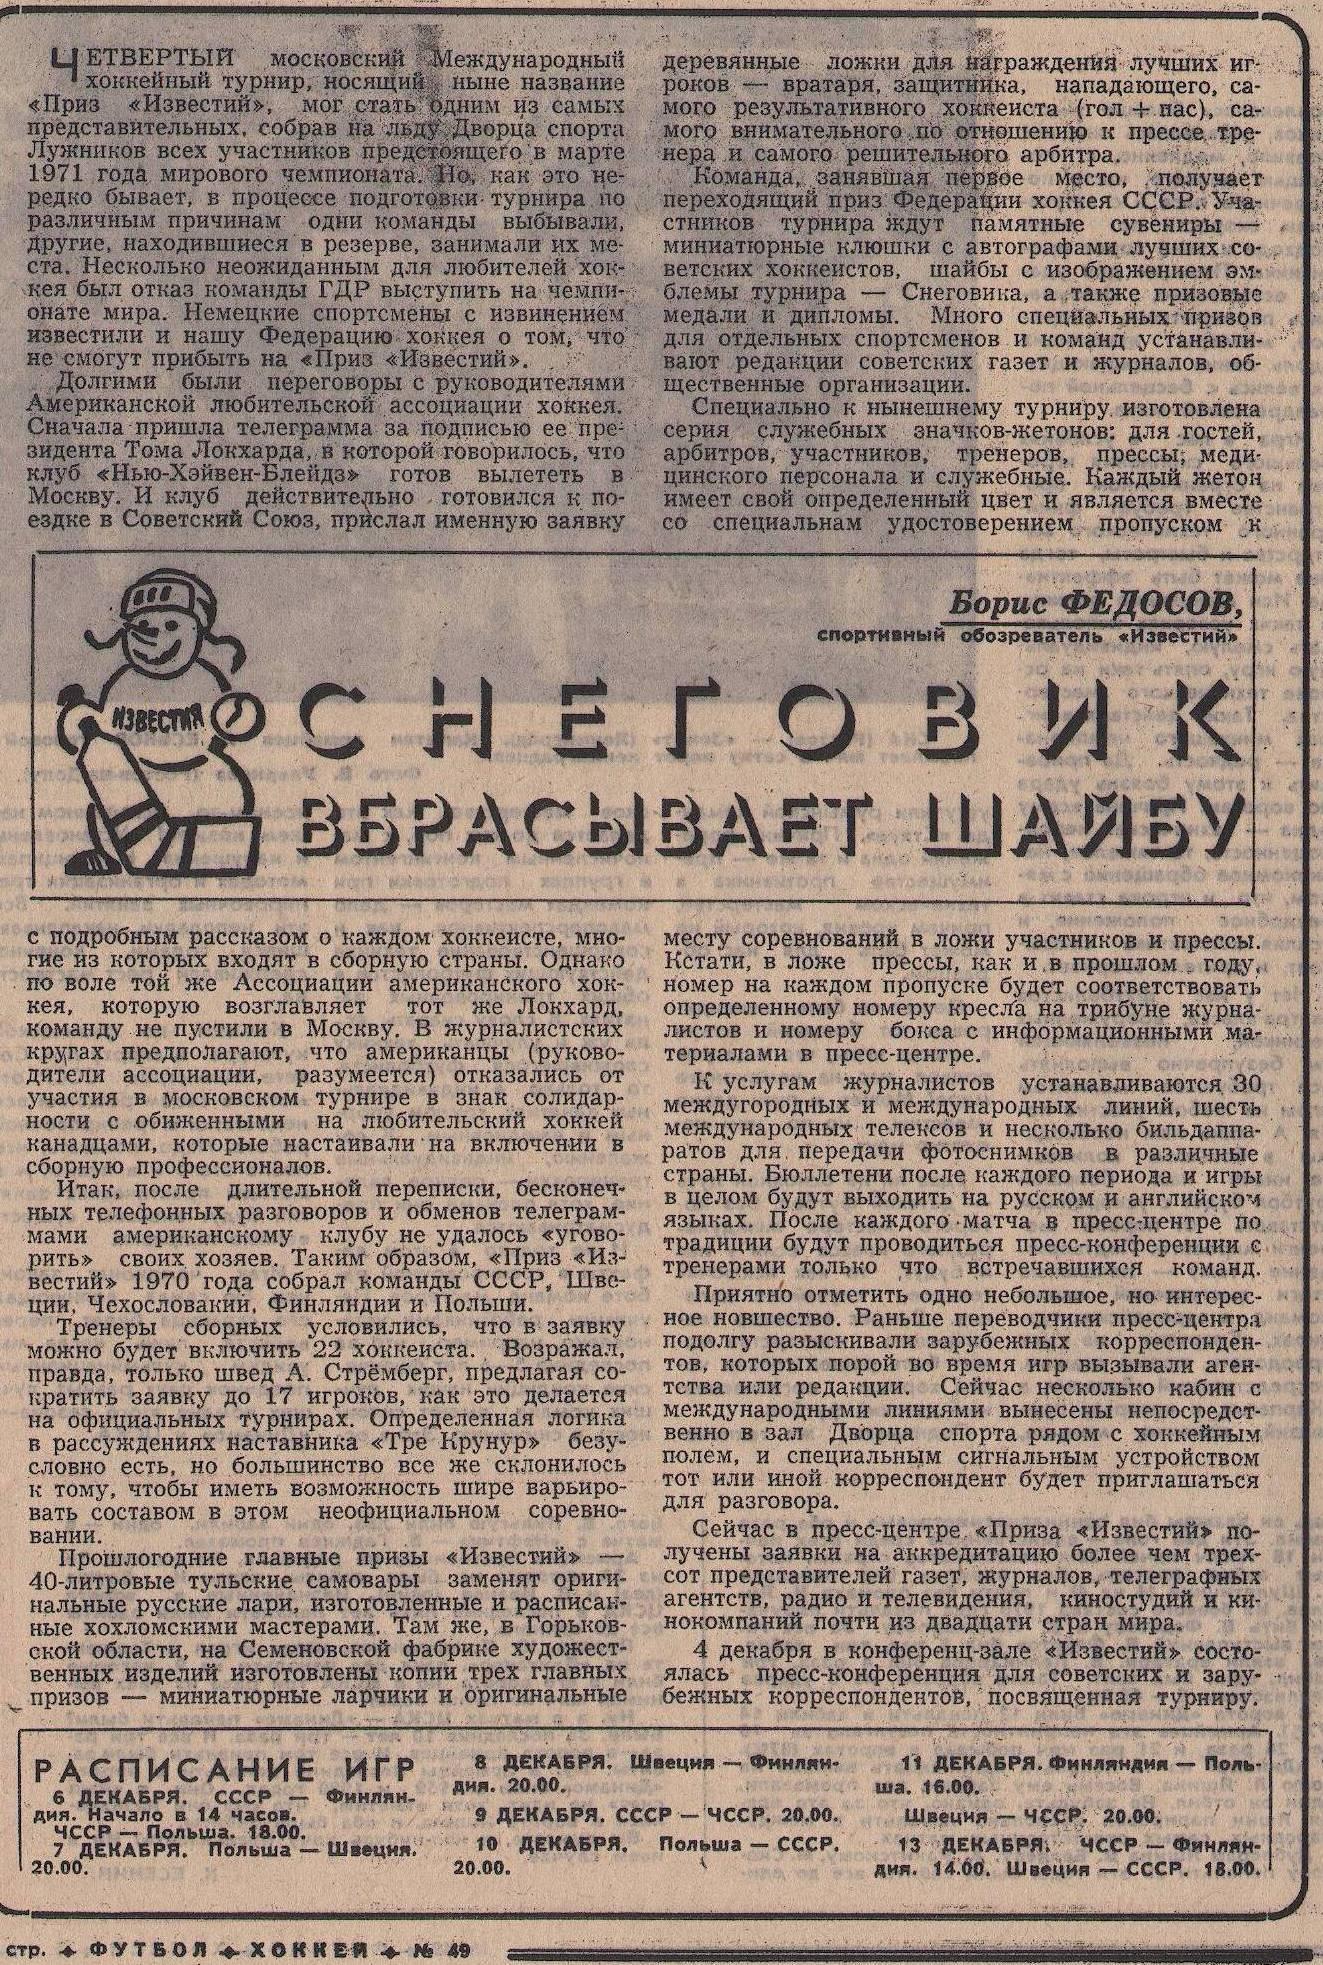 ПИ-1970.Футбол-Хоккей.1970.349..jpg